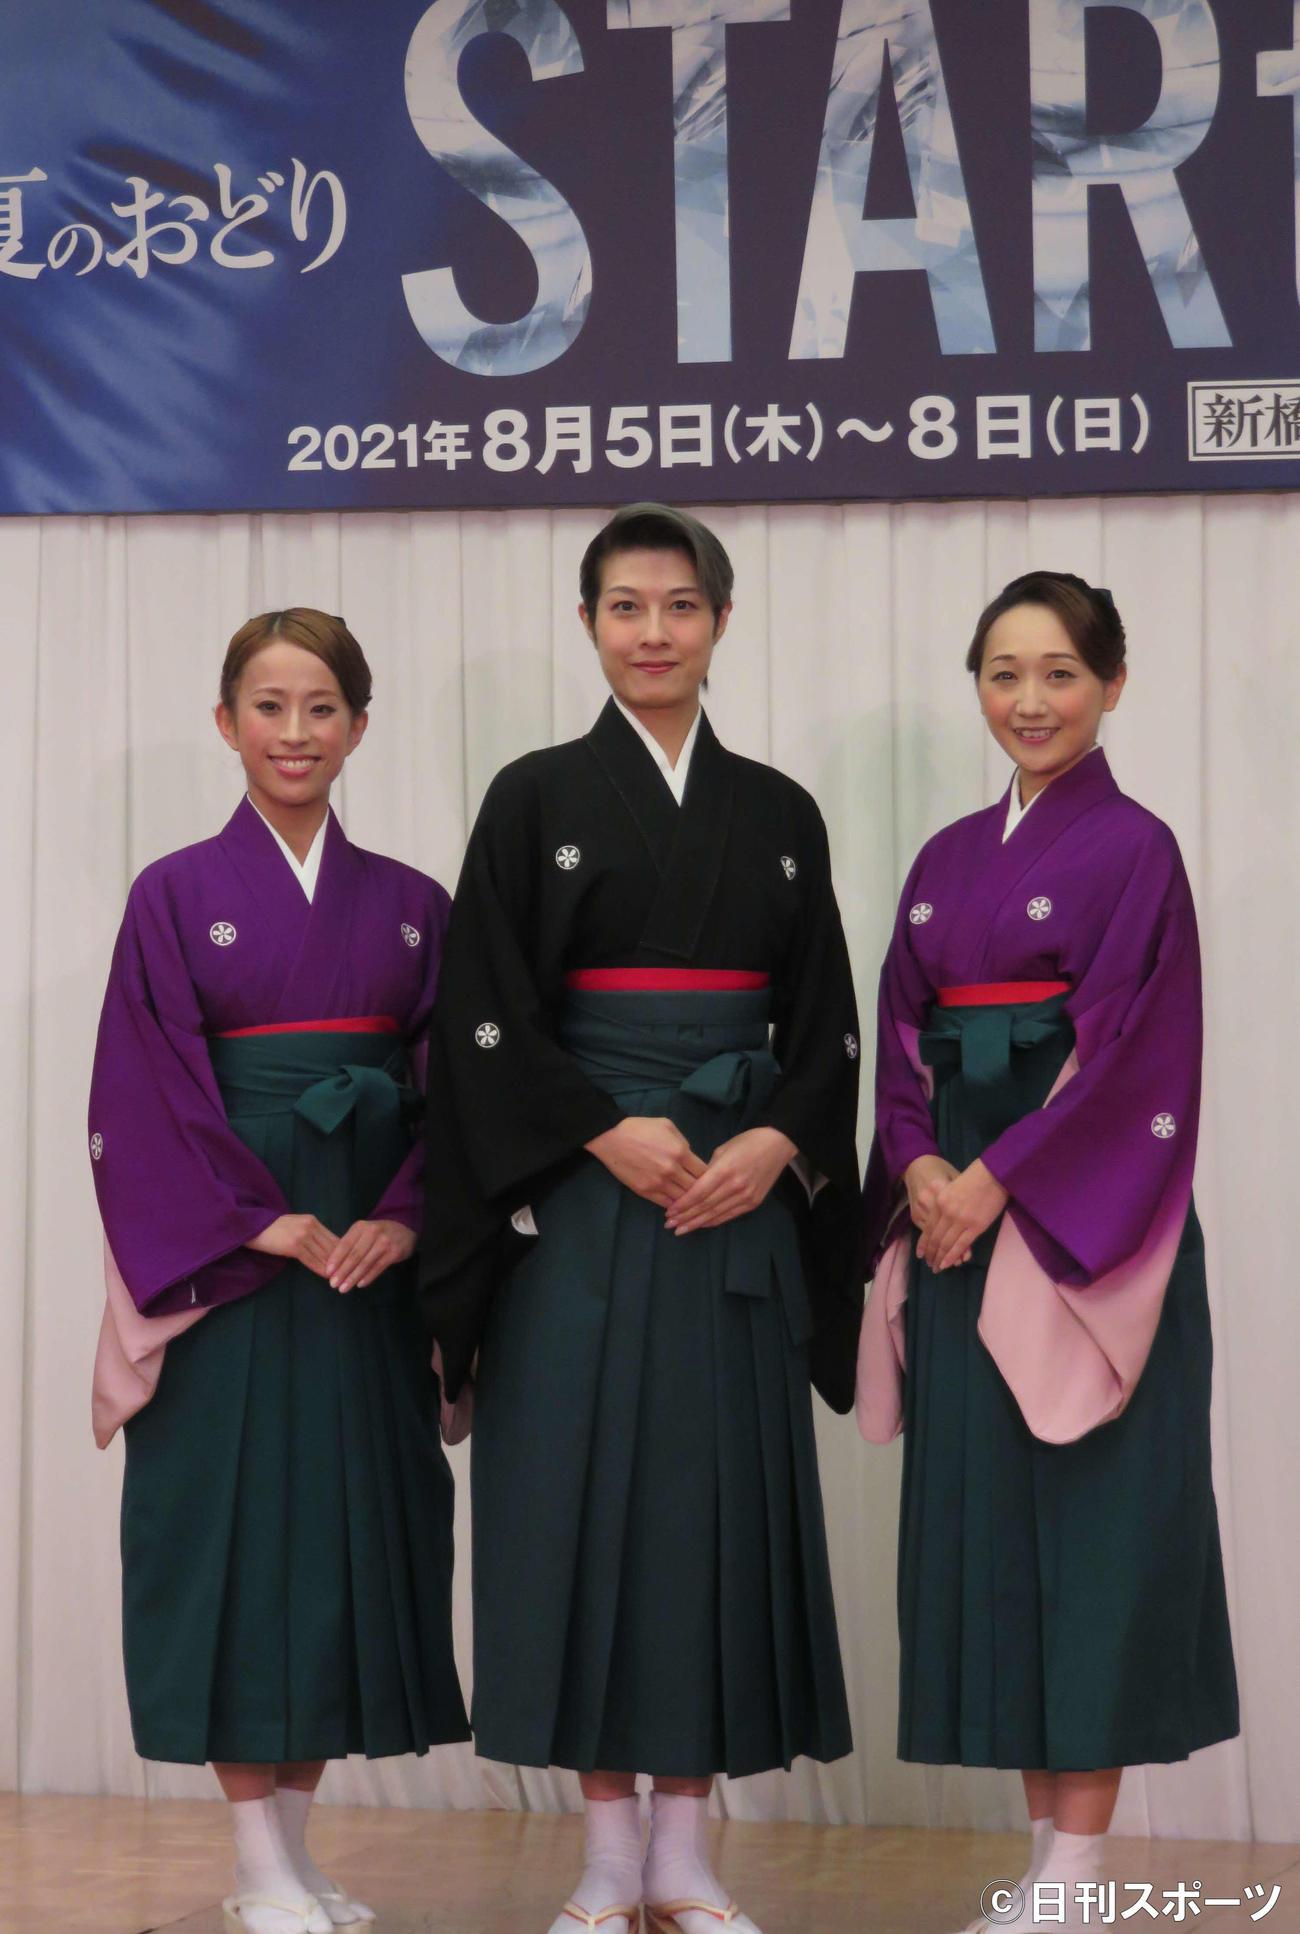 OSK日本歌劇団「レビュー夏のおどり『STARTt』」の制作会見に出席した、左から千咲えみ、楊琳、舞美りら